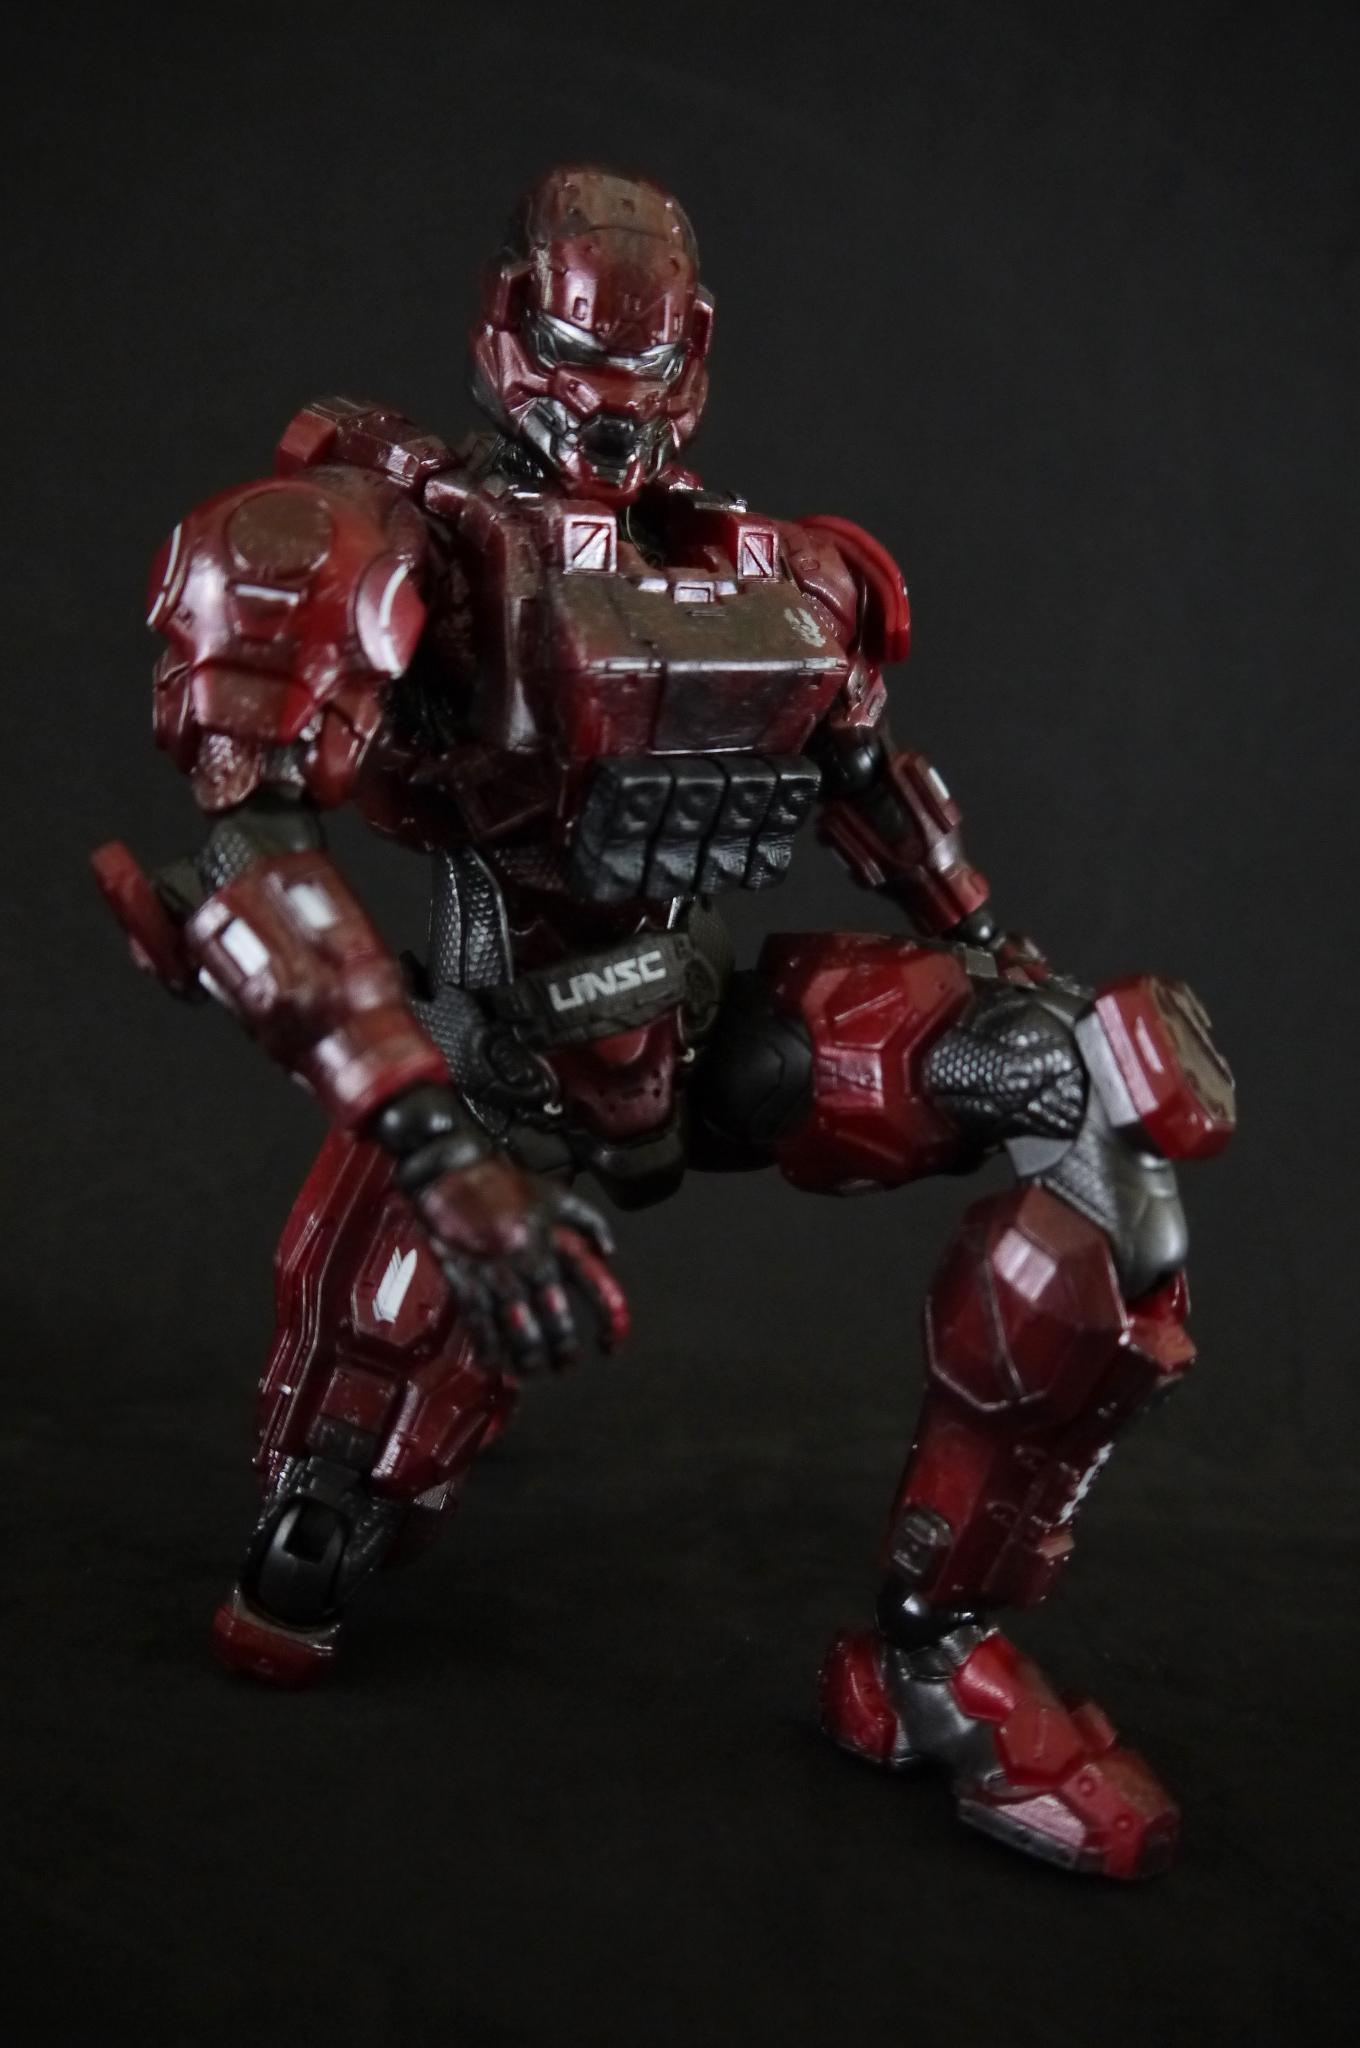 halo 4 play arts kai red spartan warrior supar robo